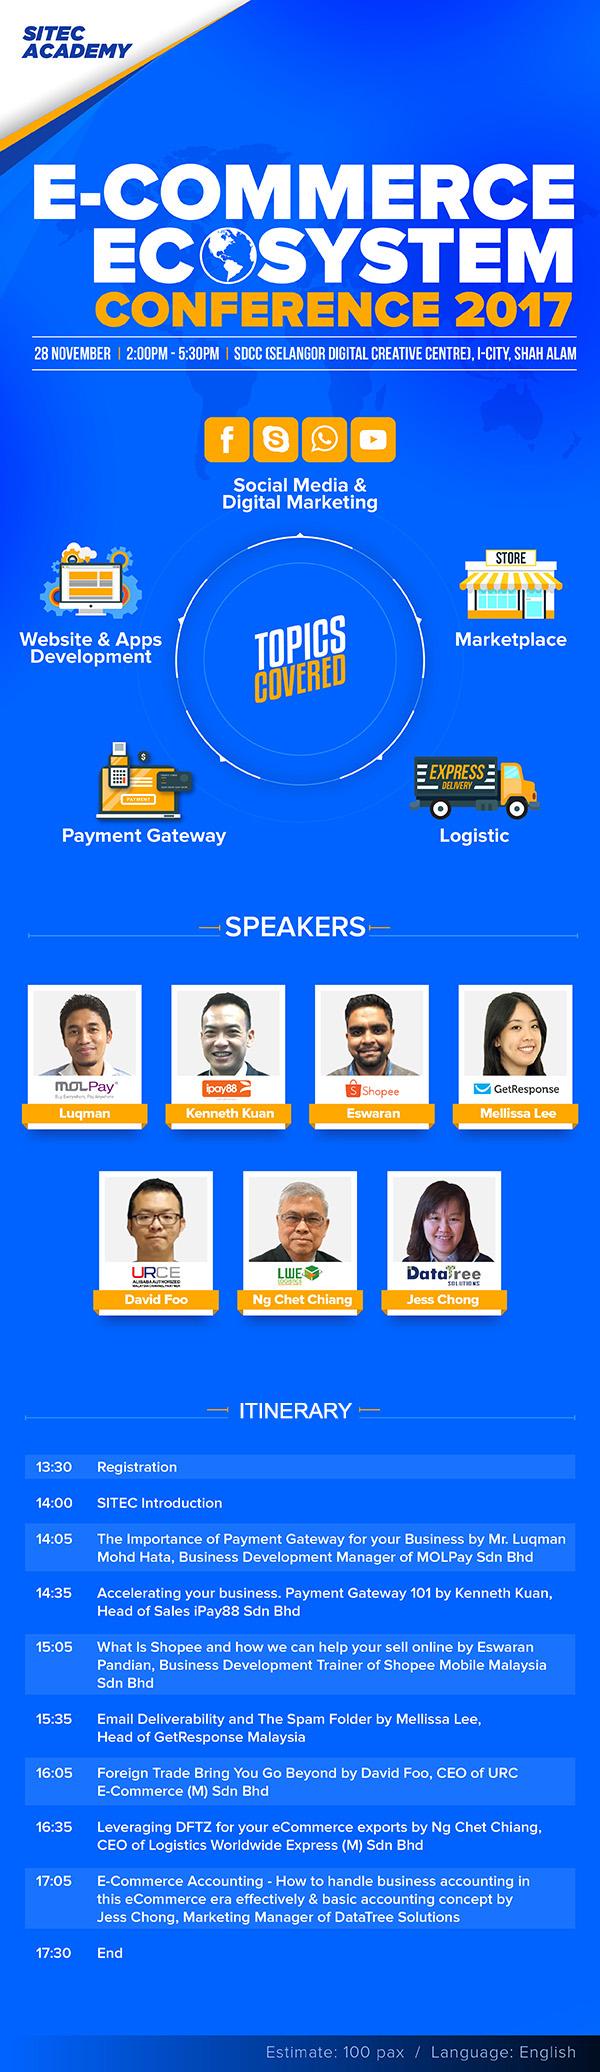 E-Commerce Ecosystem Conference 2017